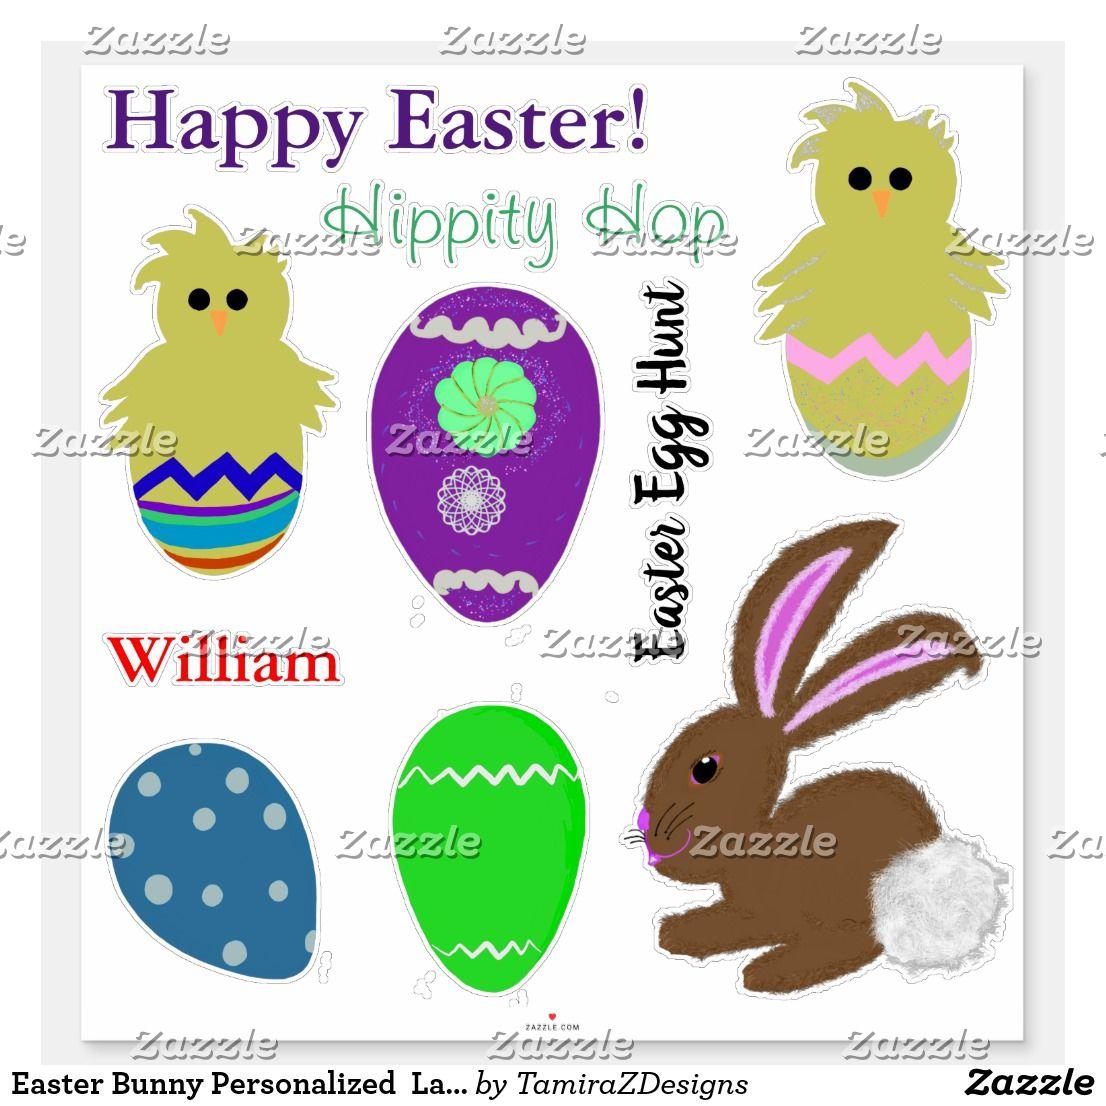 Easter Bunny Personalized Laser Cut Vinyl Sticker   Zazzle